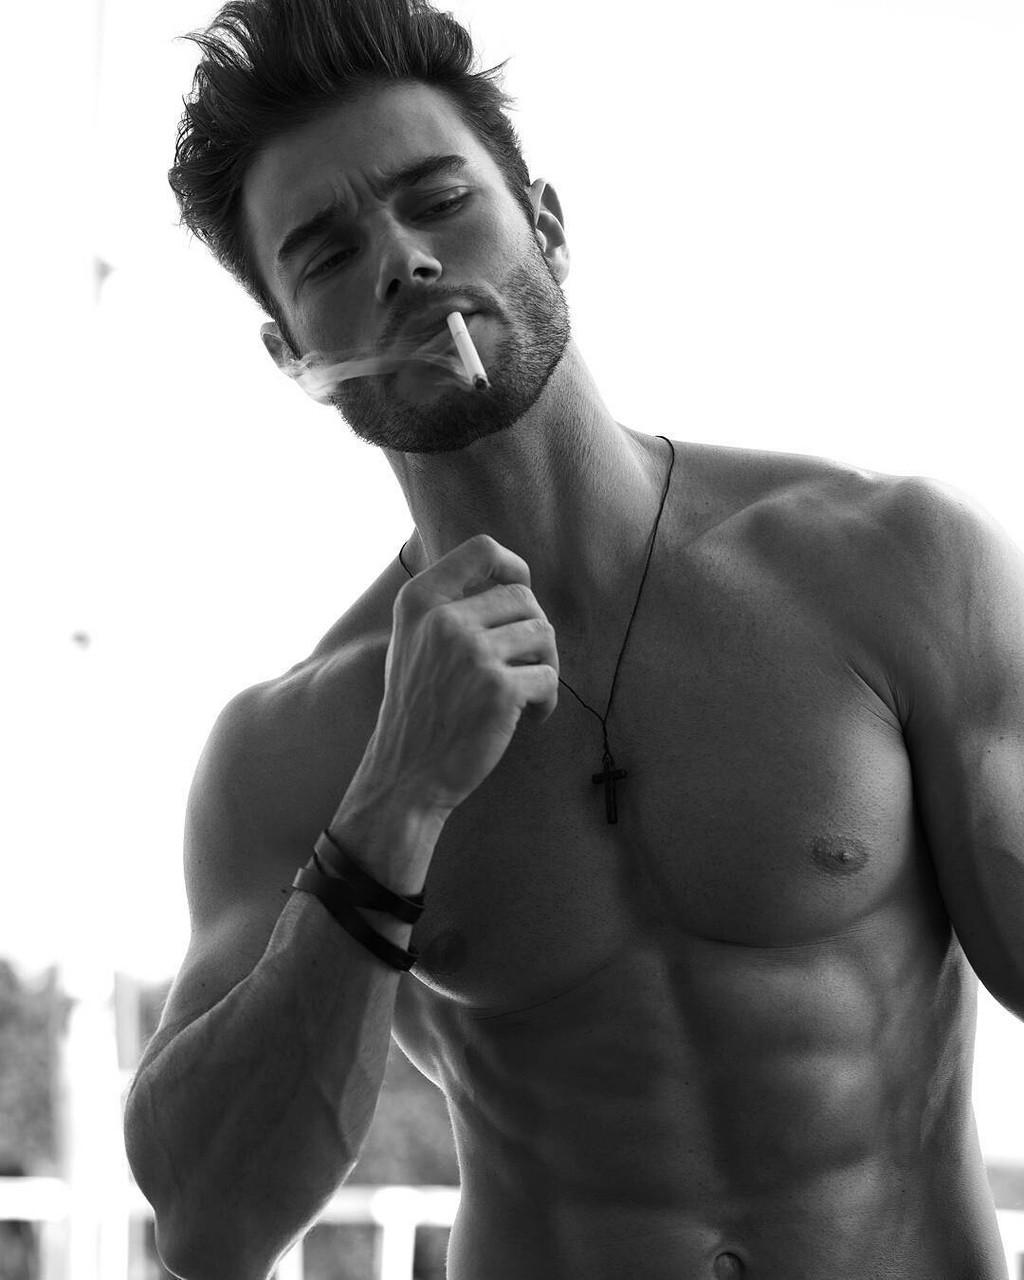 Bad boy confident sexy masculine man stock photo